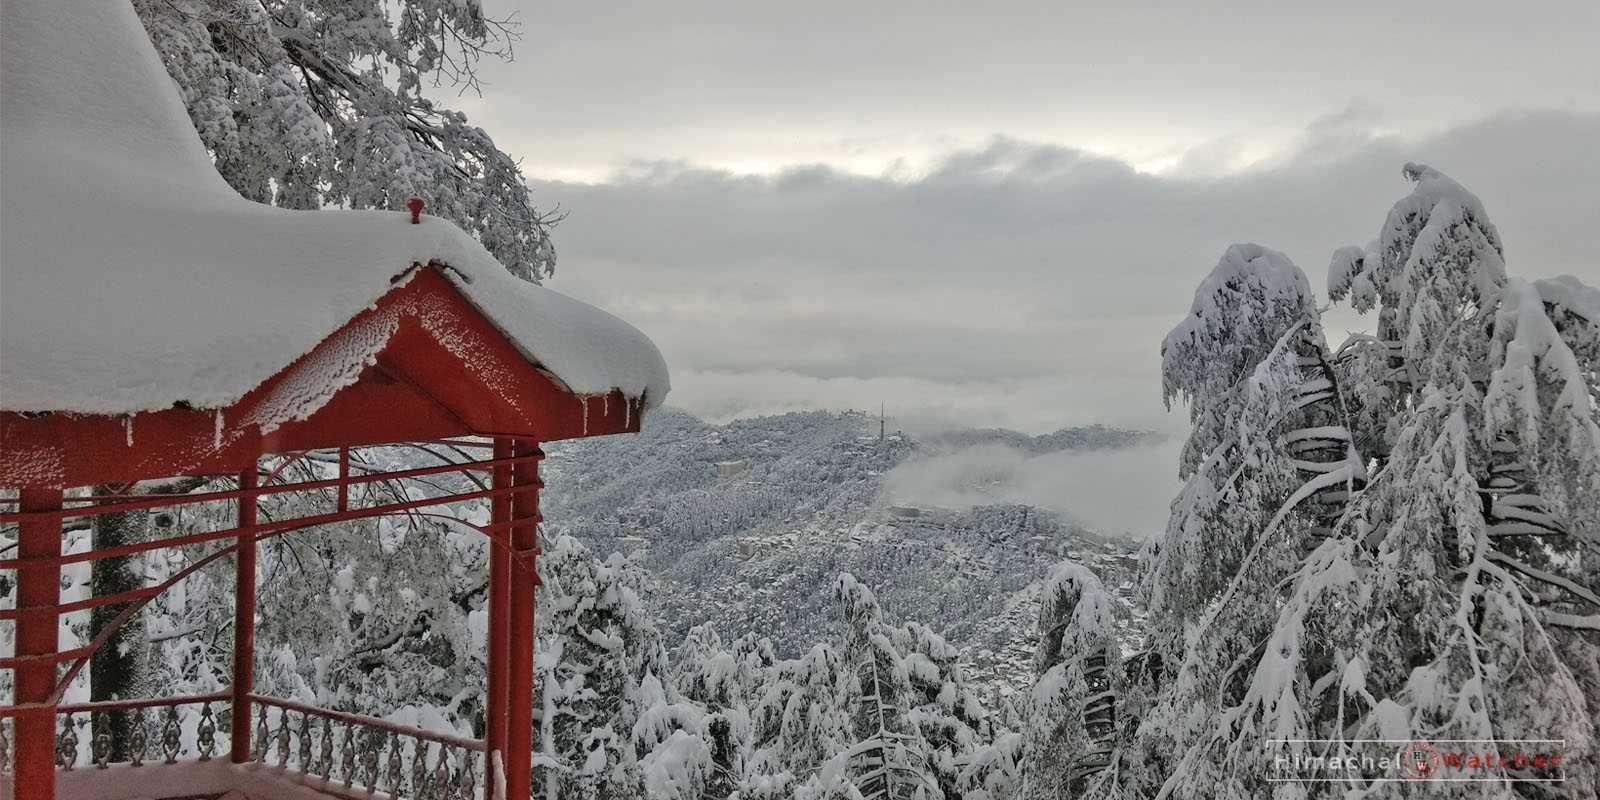 Snow prediction for shimla 2020